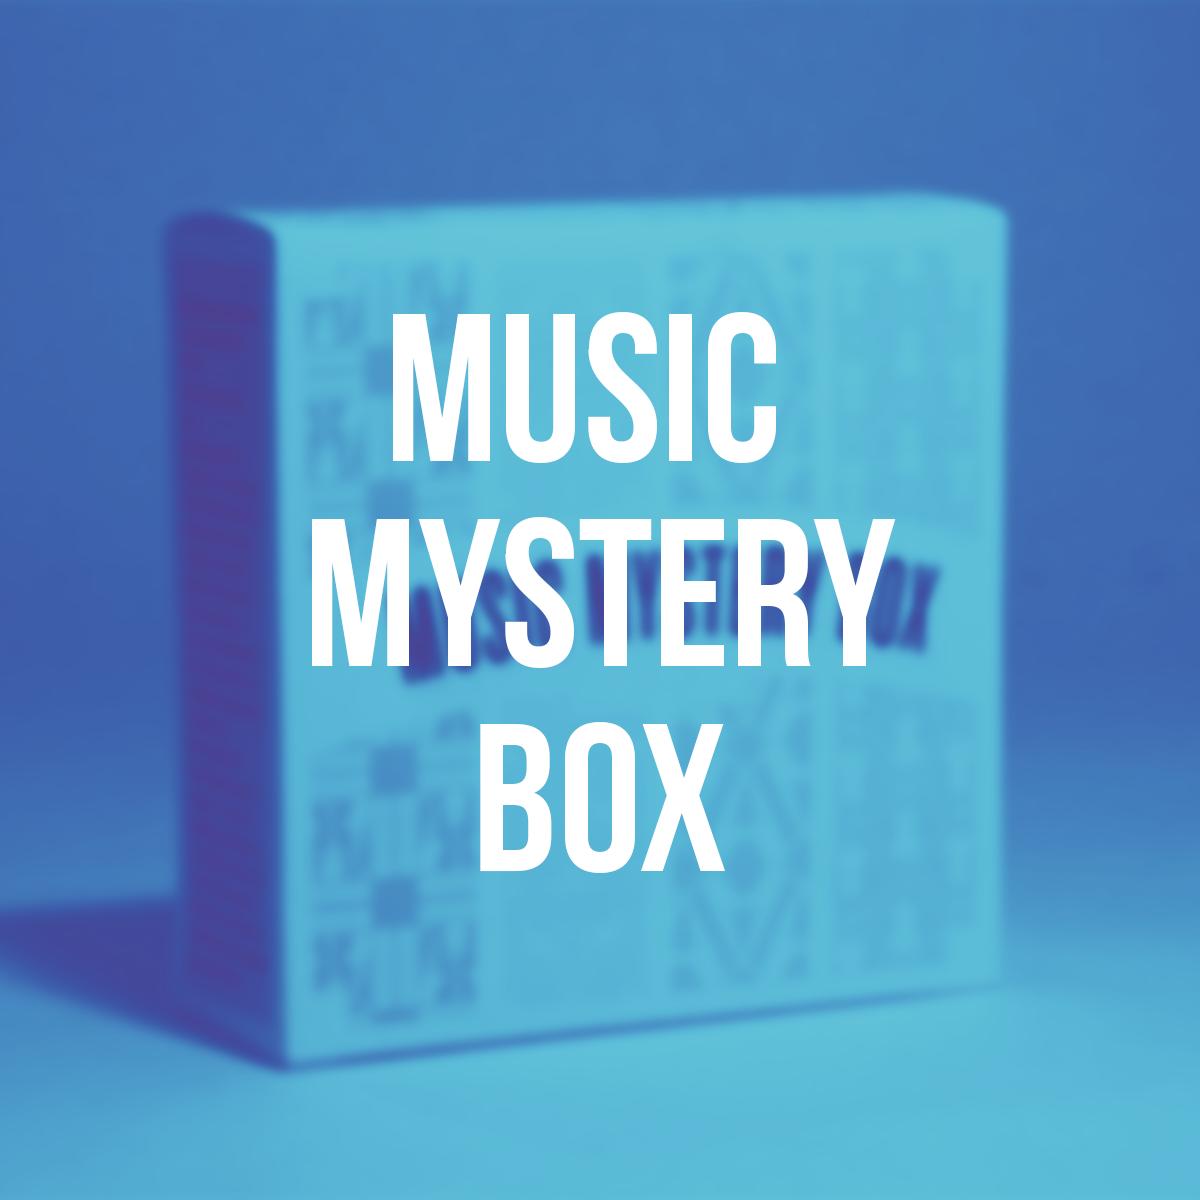 Music Mystery Box - Packaging / Print